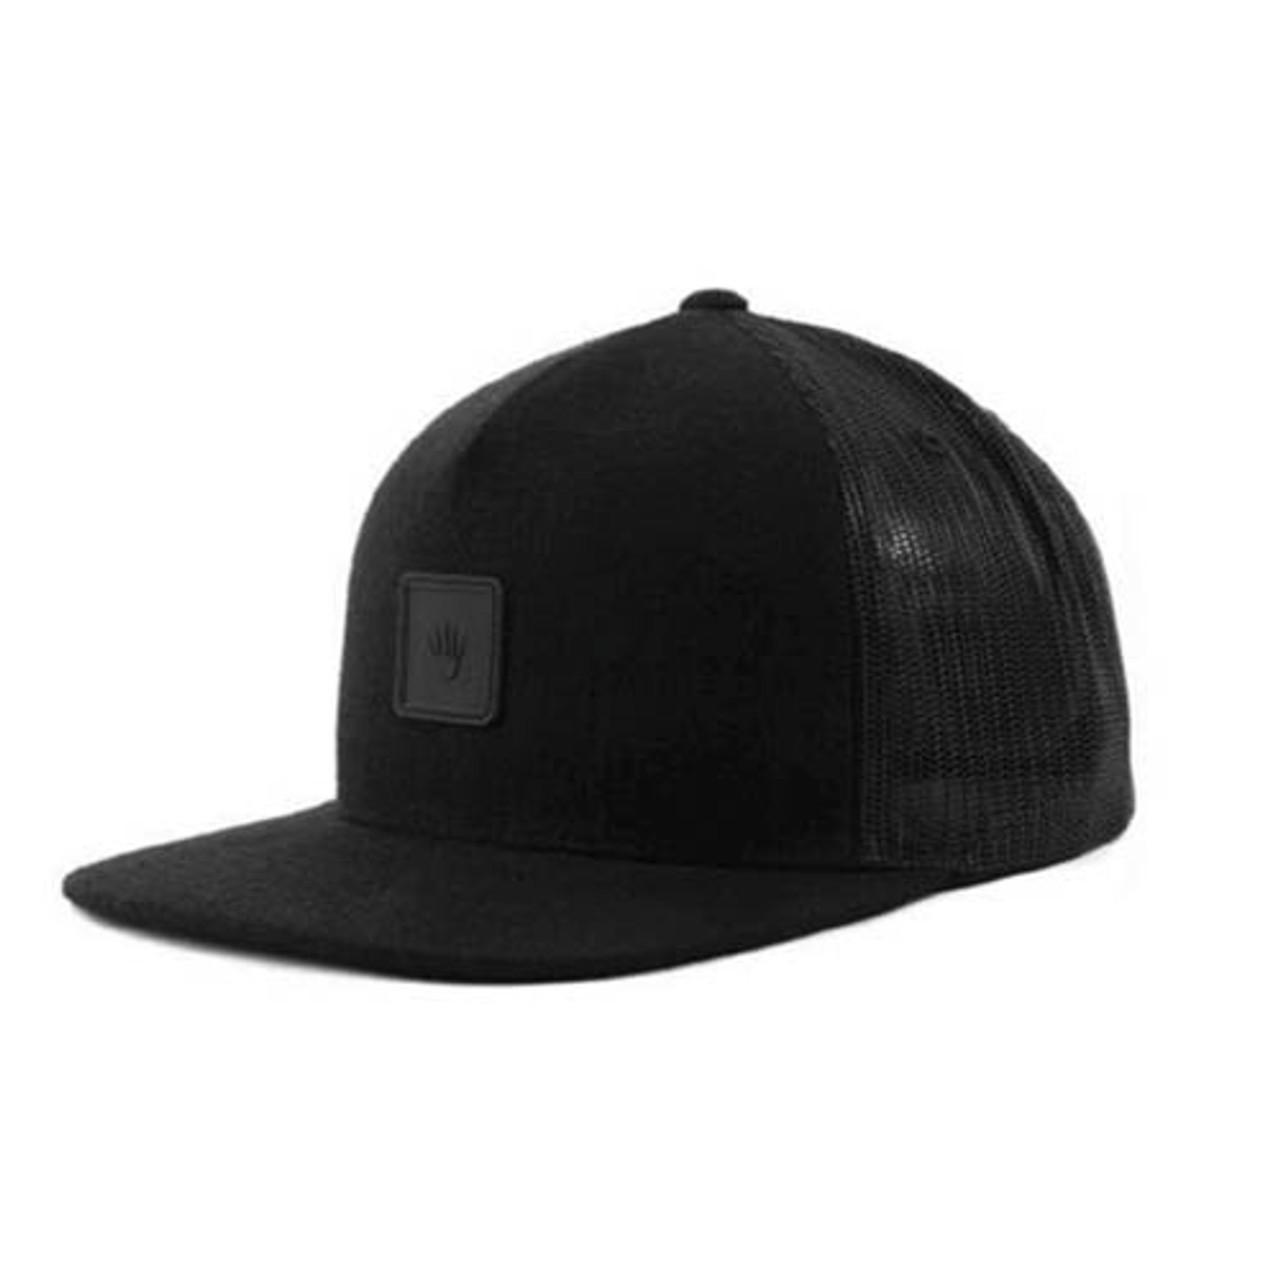 No Bad Ideas - Snapback Cap - Omri Leather Patch (Black)